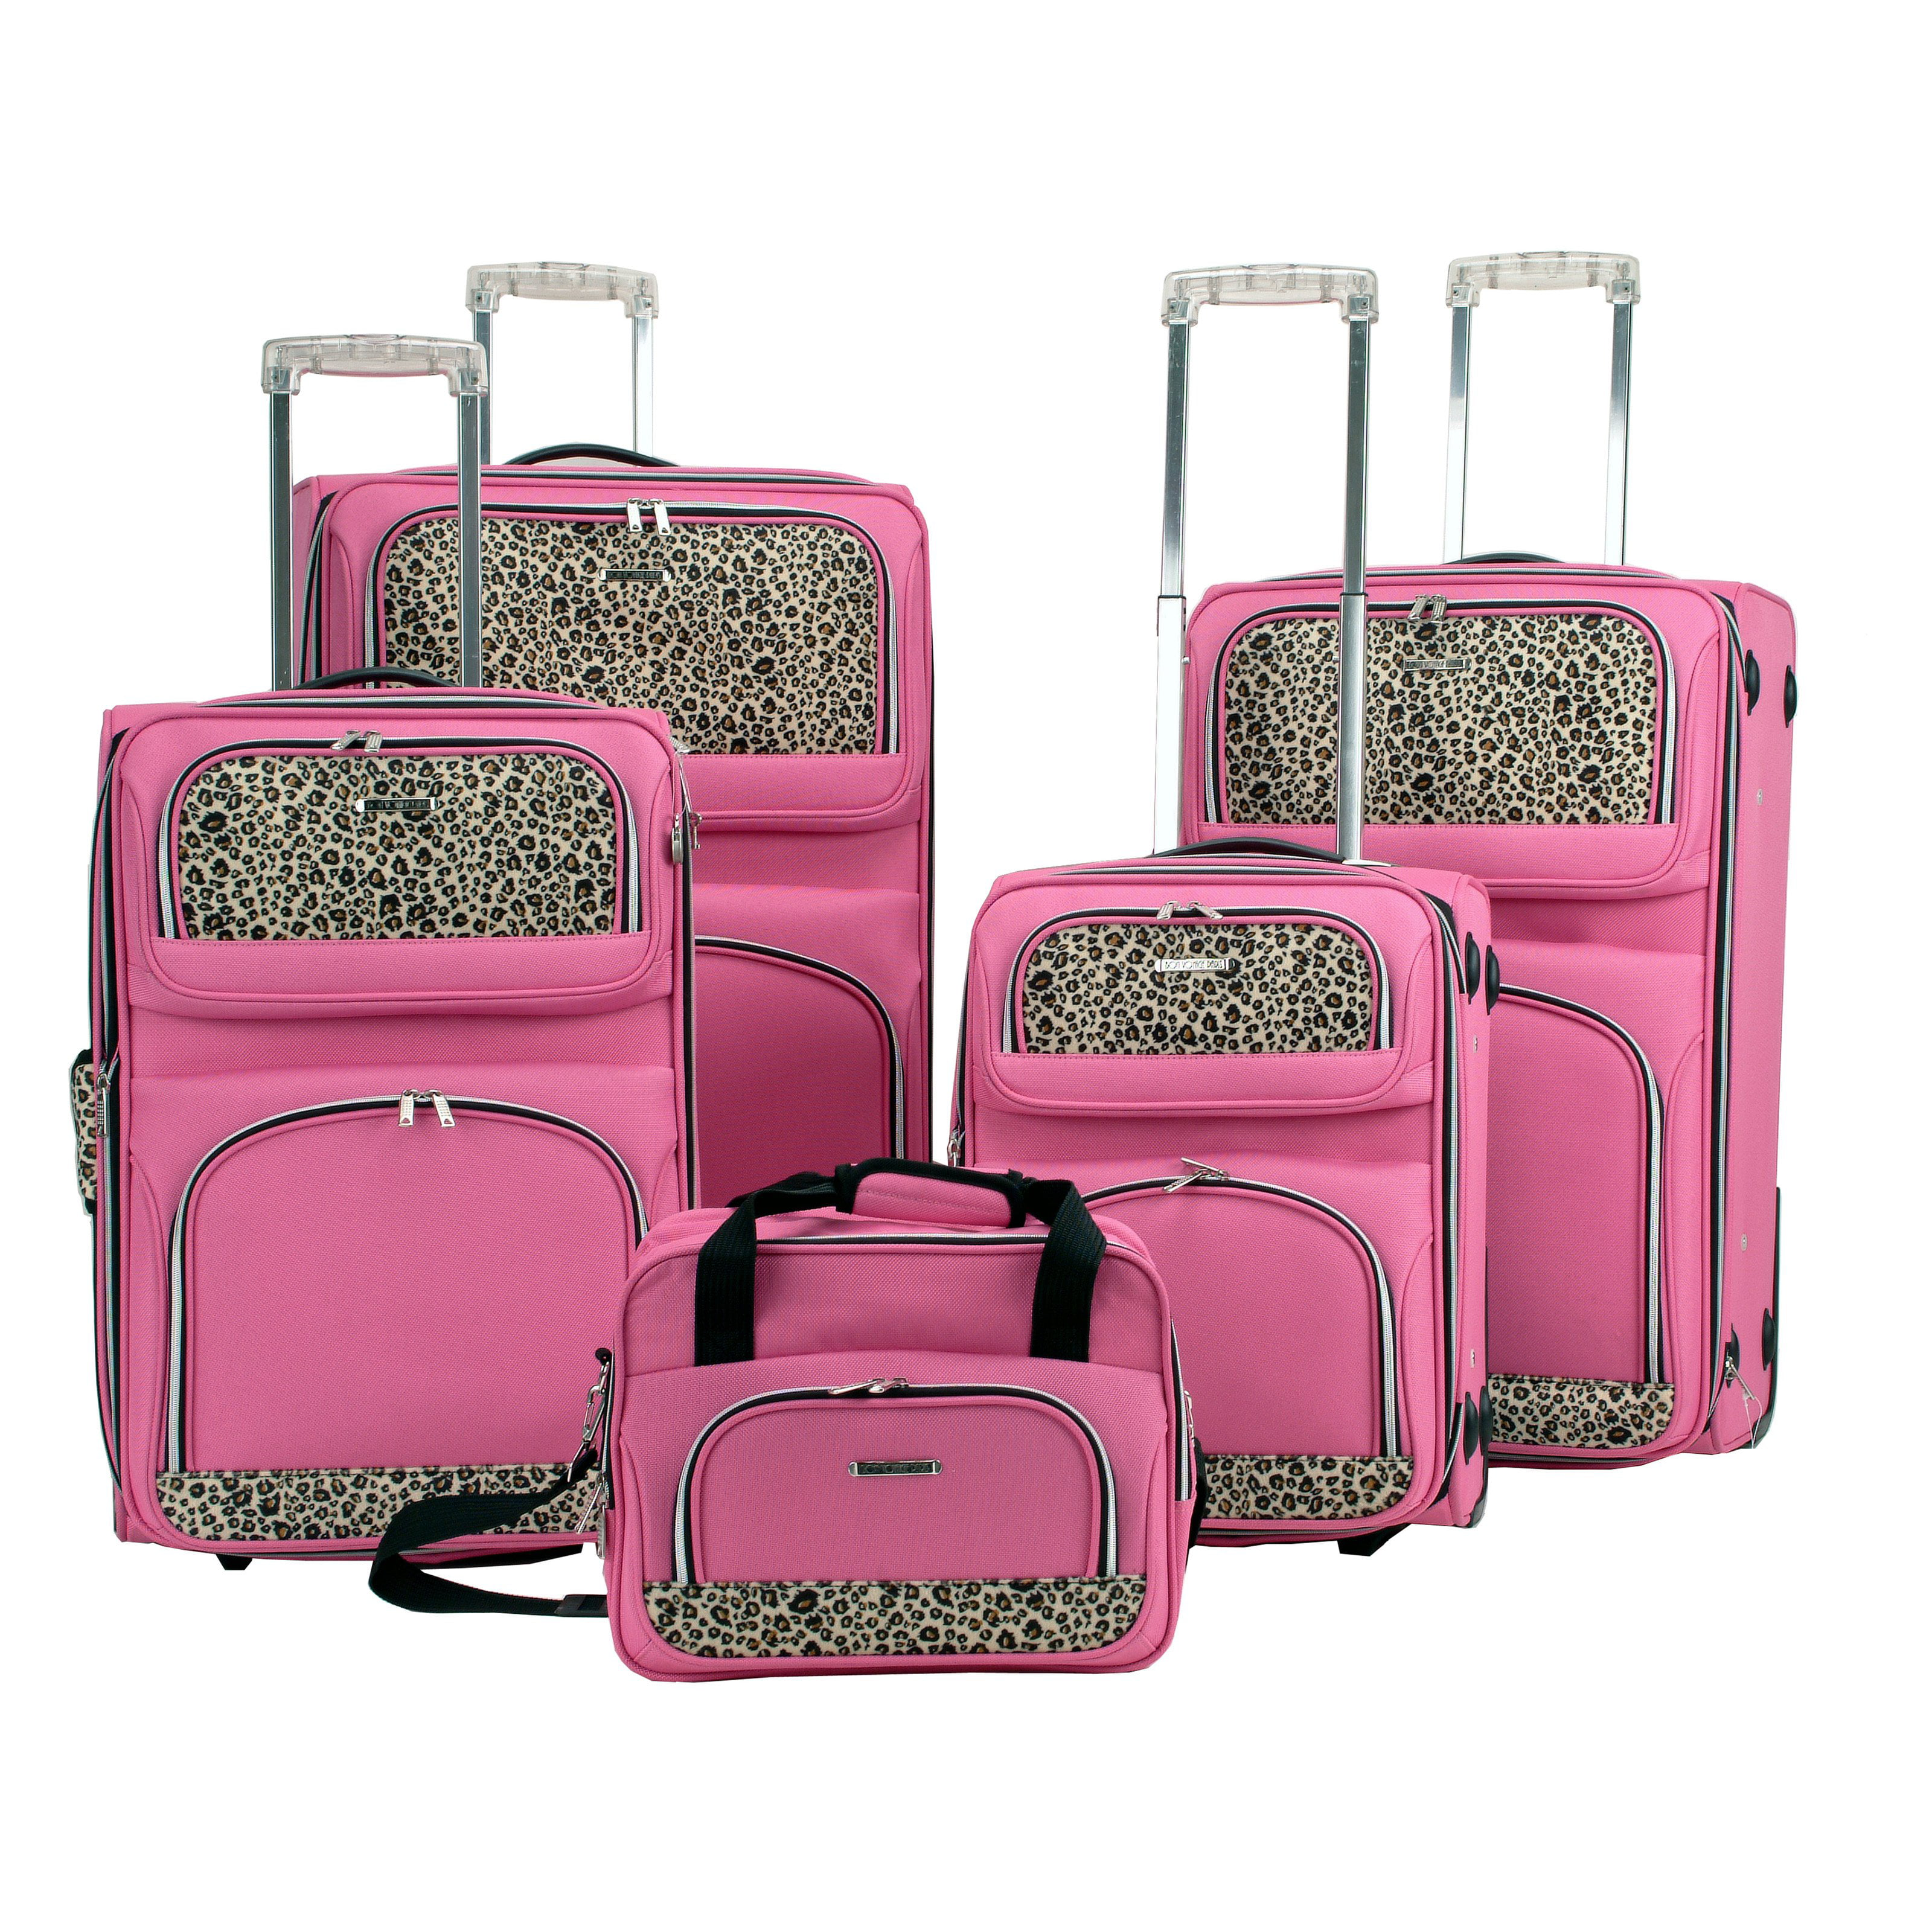 Rockland 5-Piece Pink Leopard Luggage Set - Walmart.com